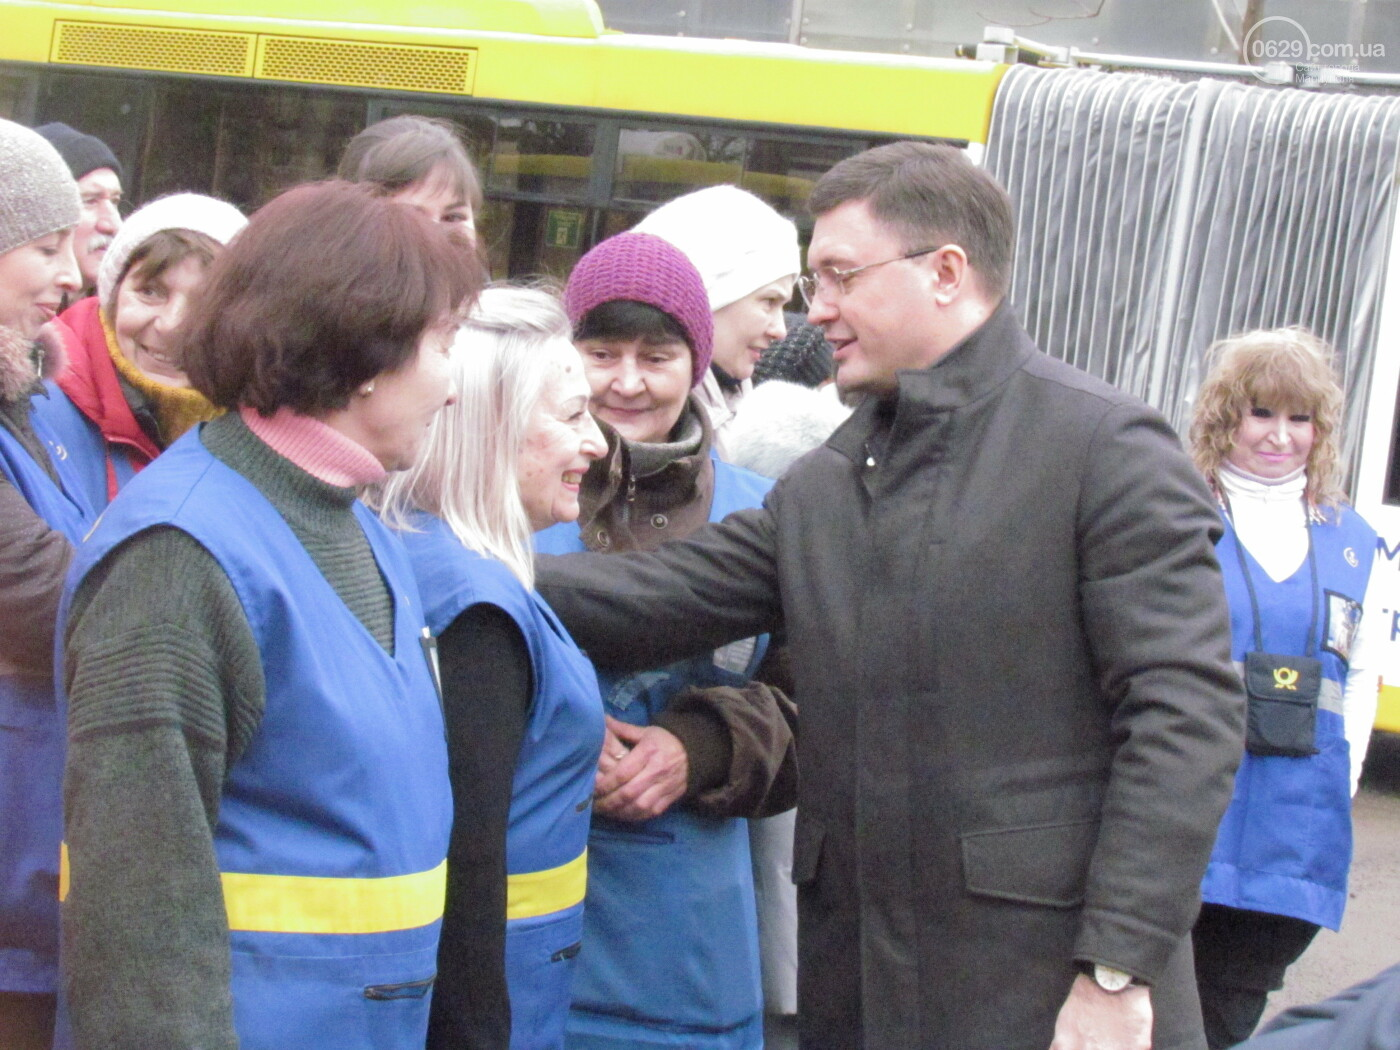 """На работу - на ""мерседесах!"" Как в Мариуполе обновляют транспорт, маршруты и депо, - ФОТОРЕПОРТАЖ, фото-4"